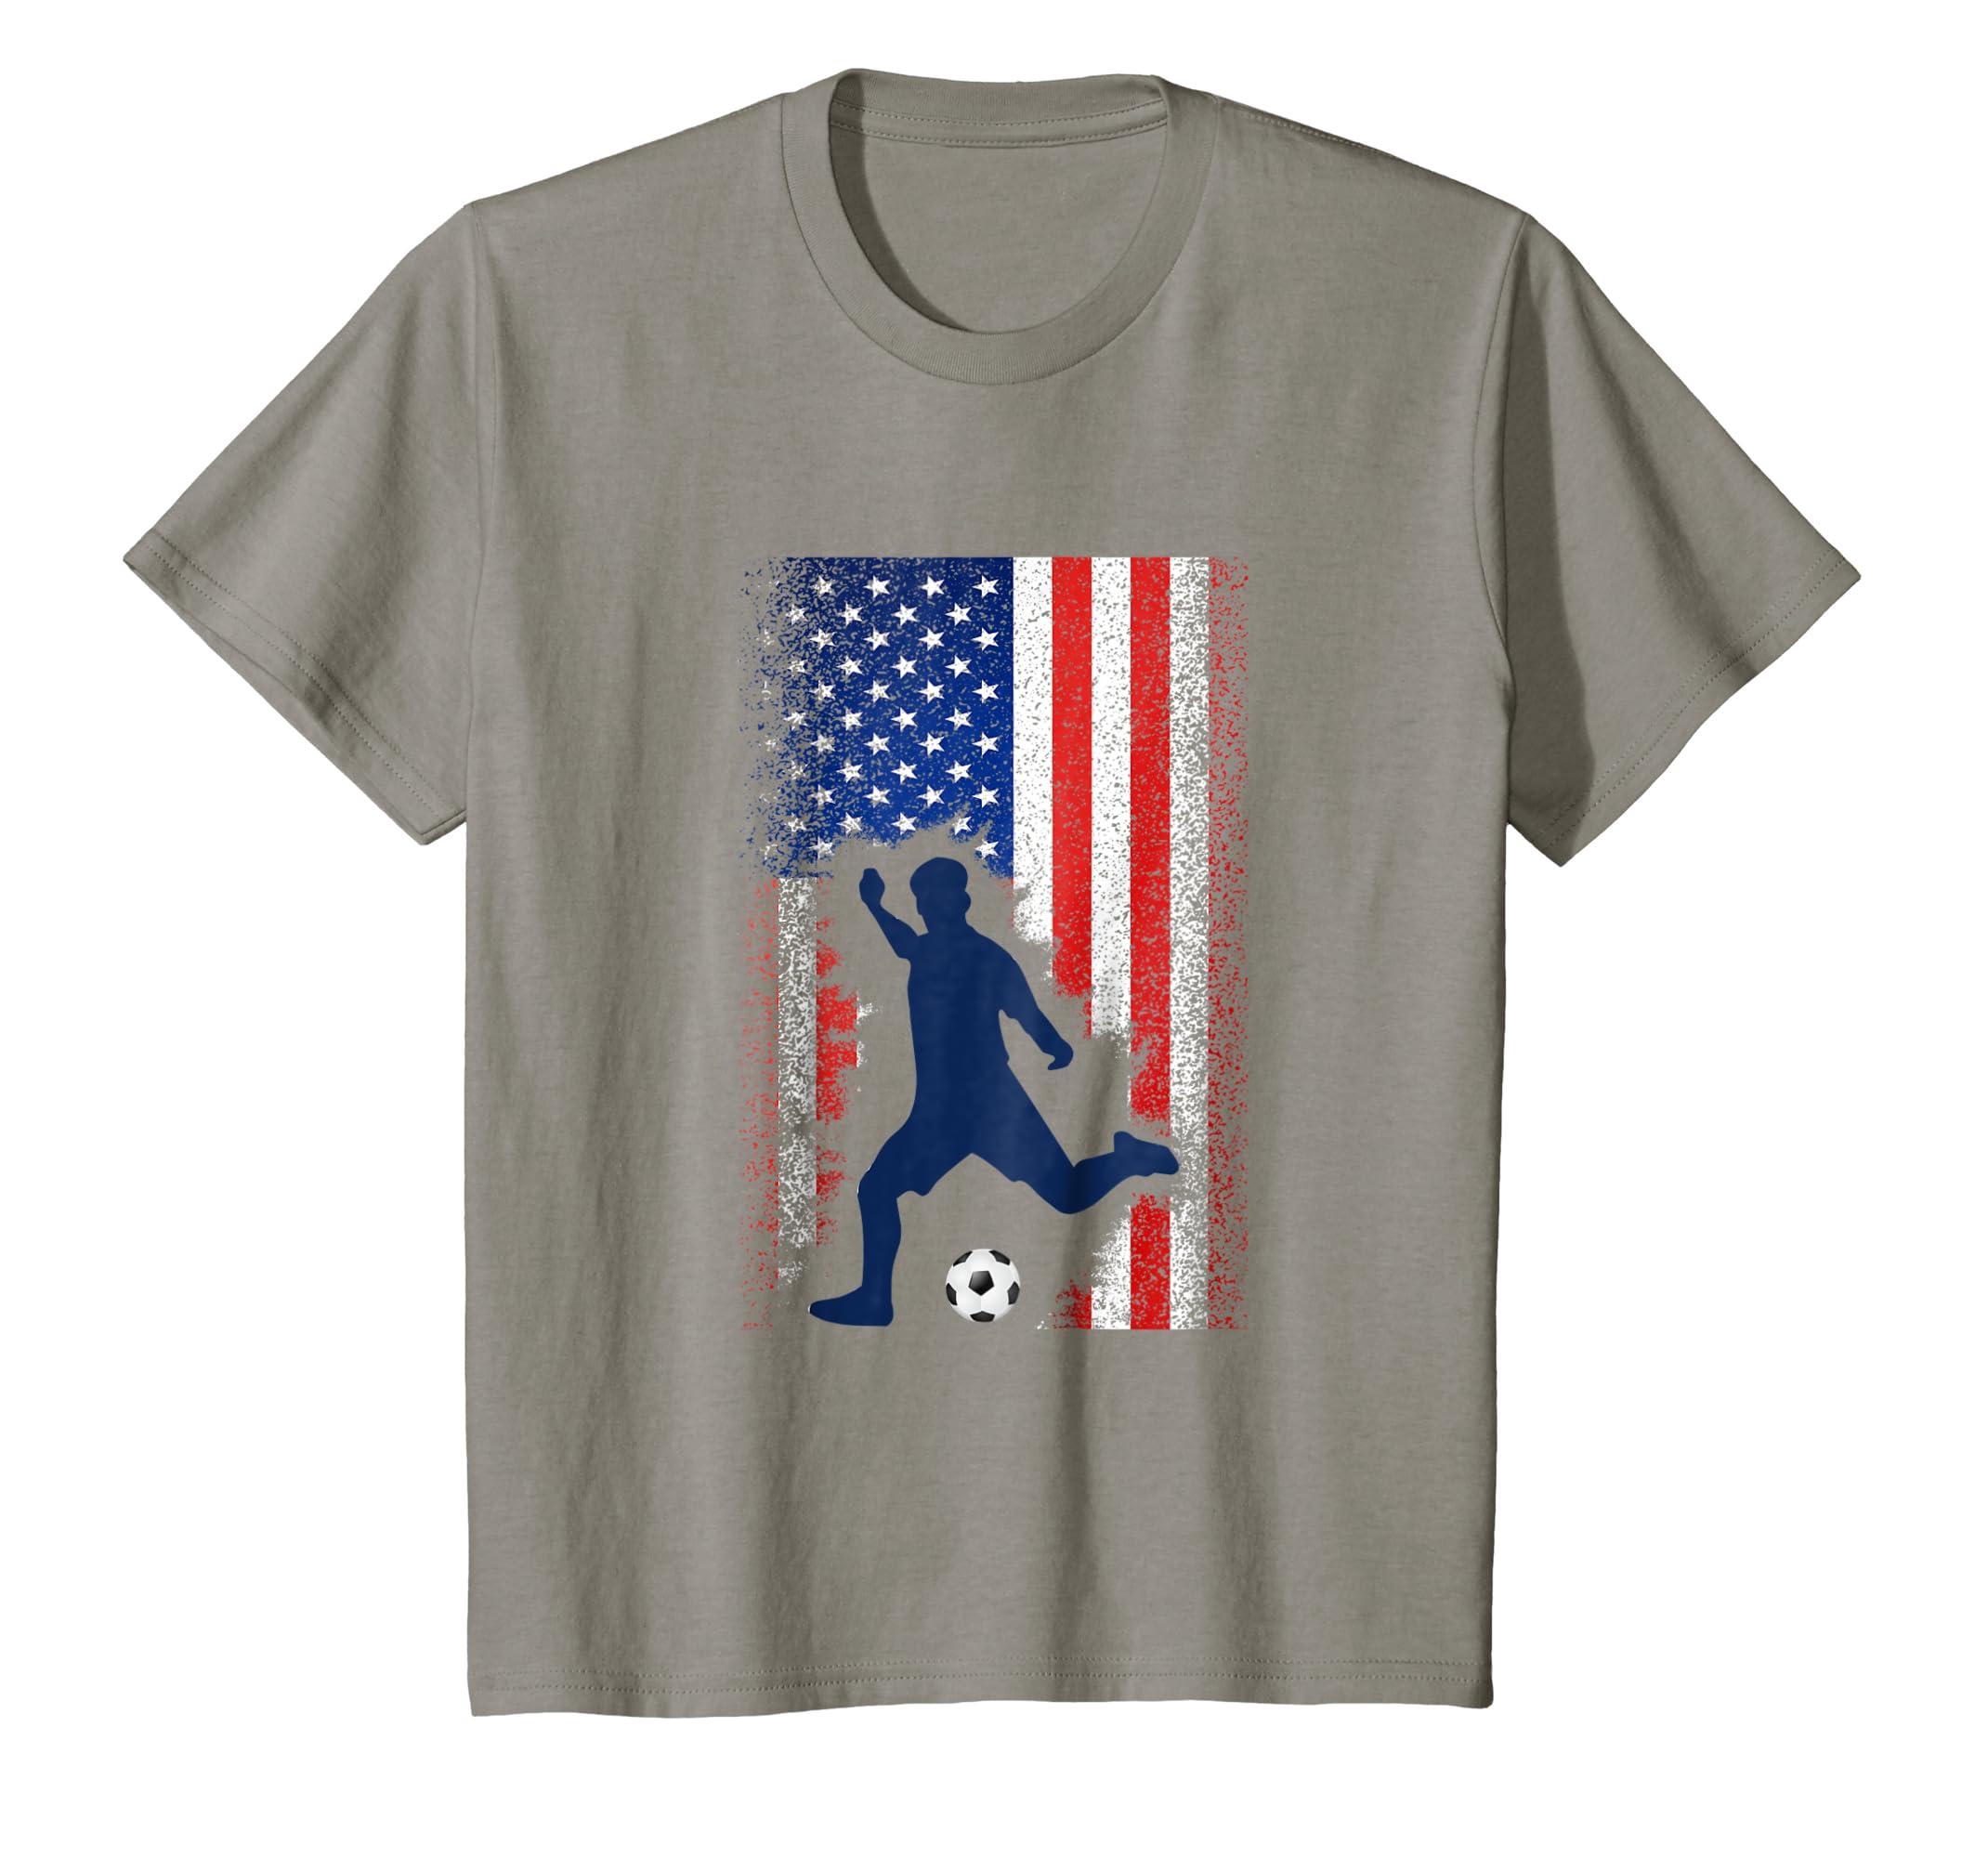 Amazon.com  American Flag Soccer Shirt USA Cool Football Jersey Gift Tee   Clothing a49bcfeb4